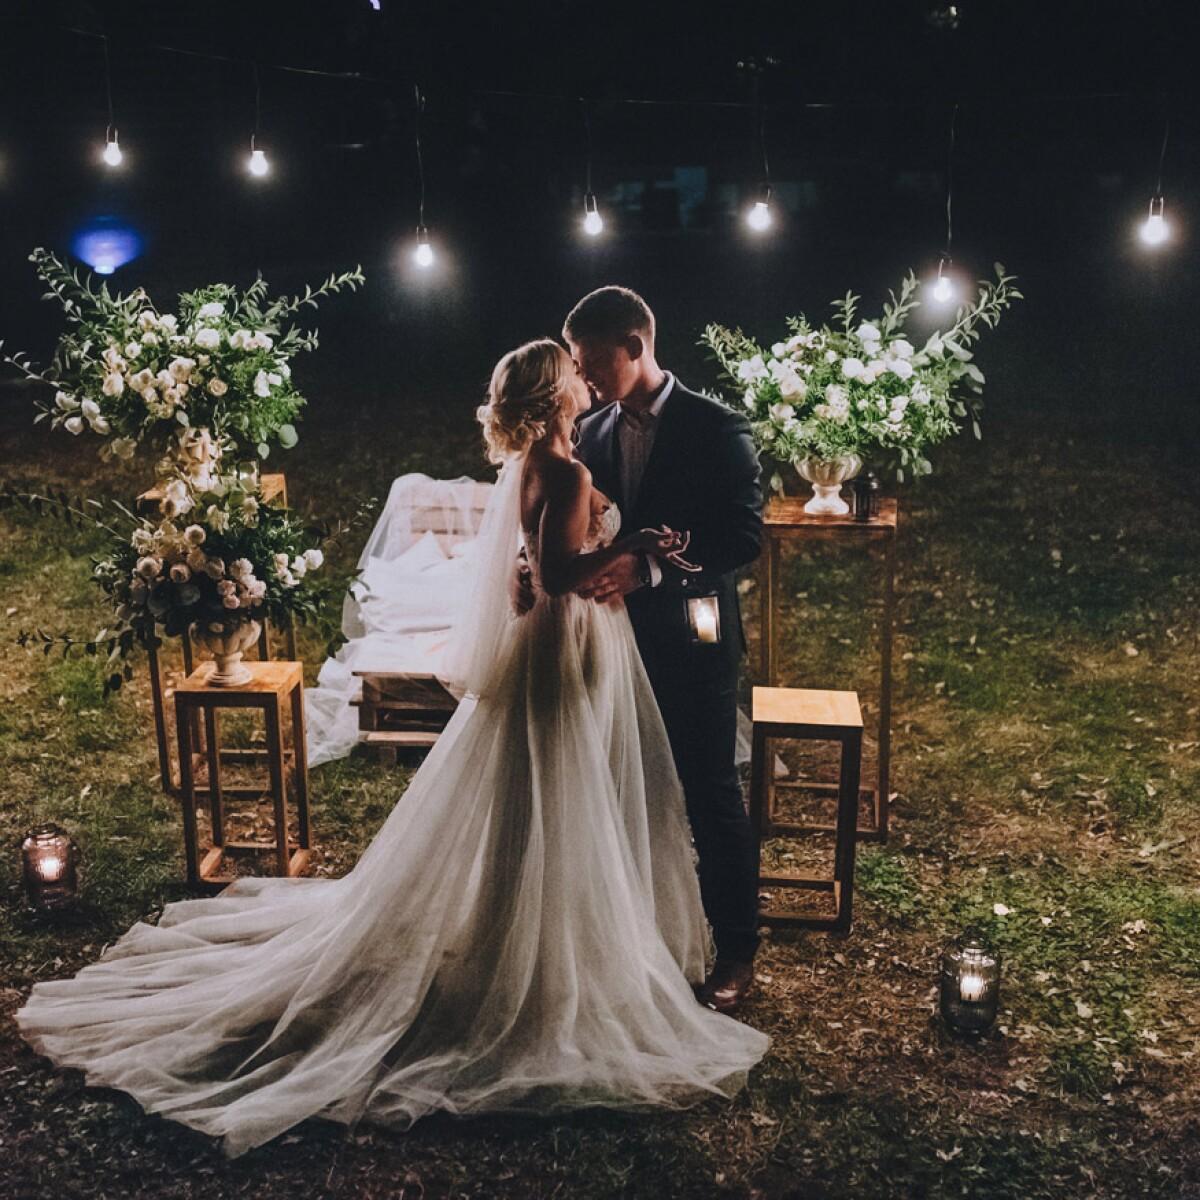 Las tendencia en bodas para 2019, según expertos